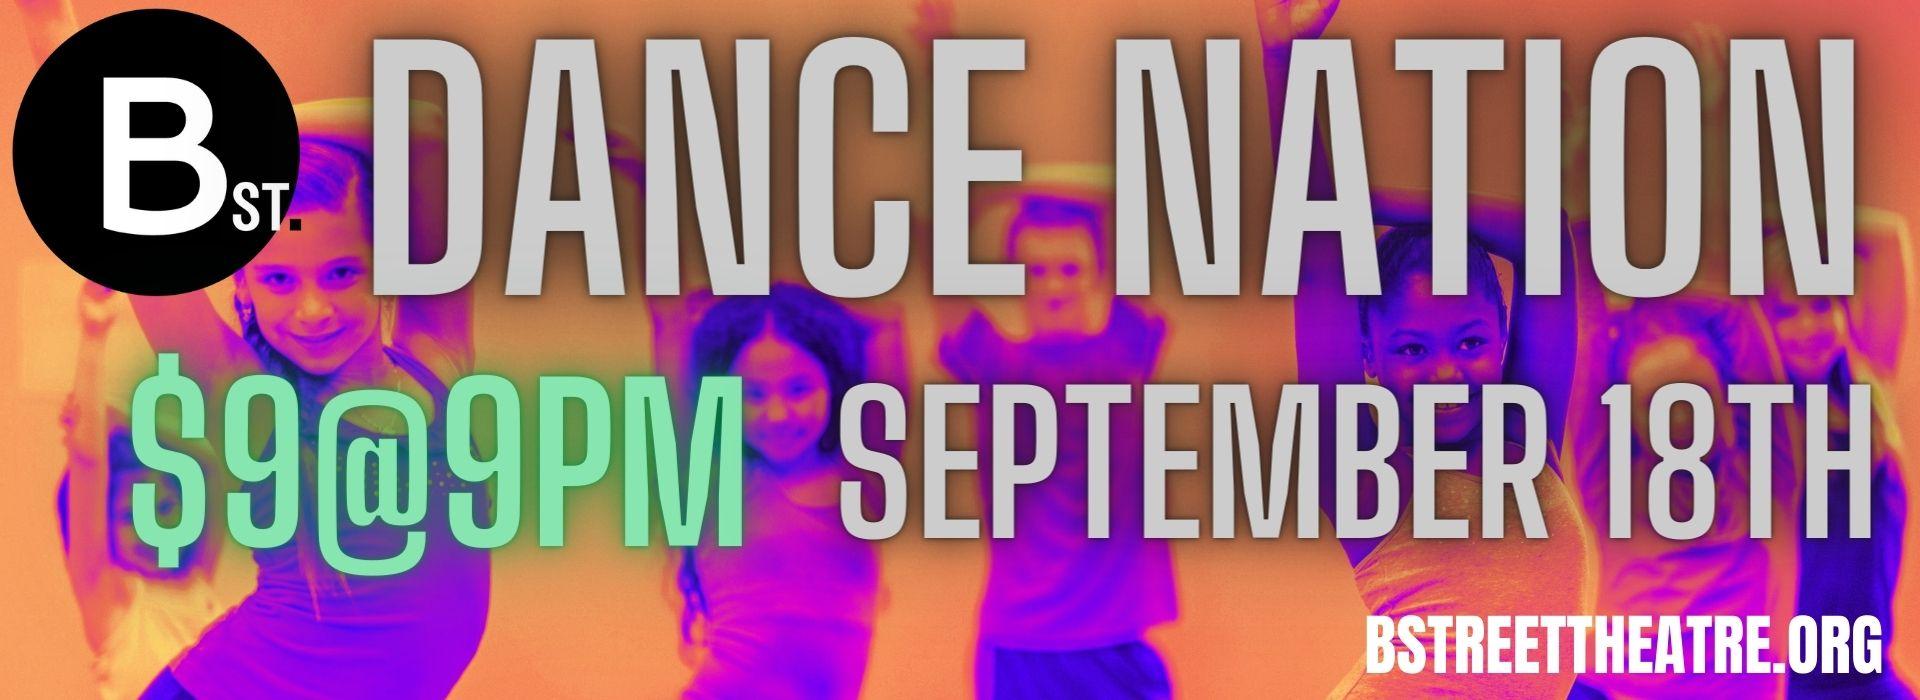 B Street Theatre: Dance Nation